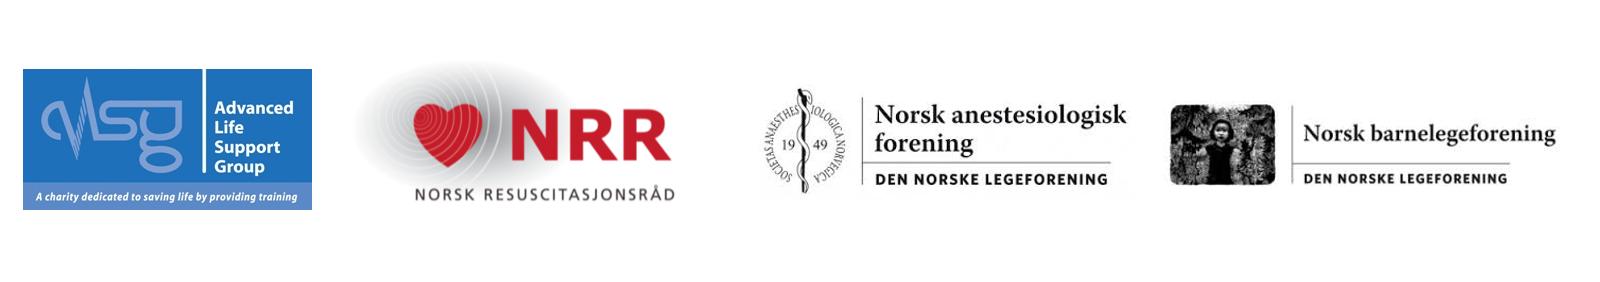 Logo med samarbeidspartnere APLS Norge